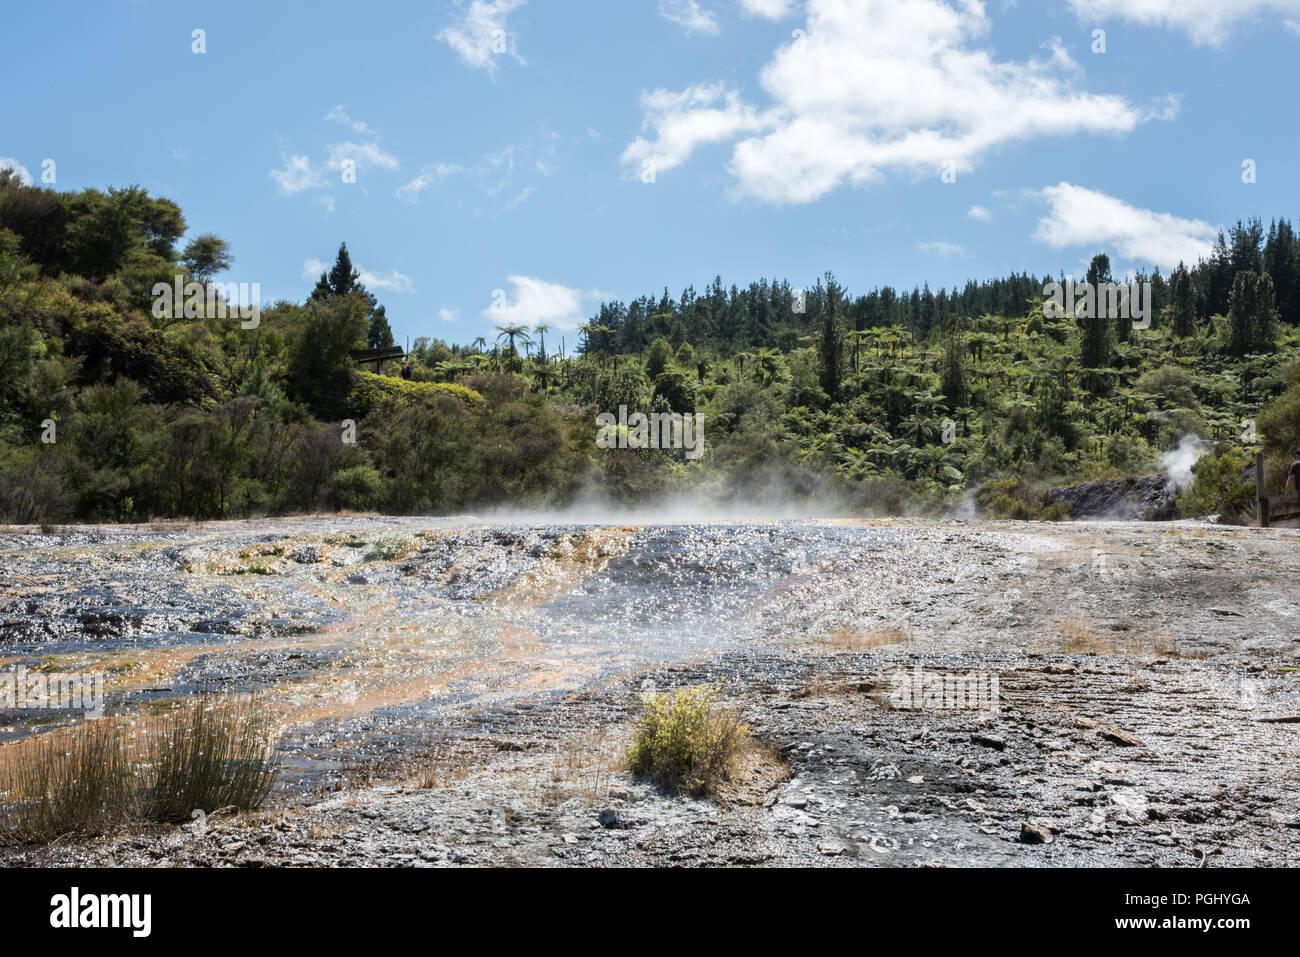 Steaming microbial mats at Orakei Korako in Rotorua, New Zealand - Stock Image